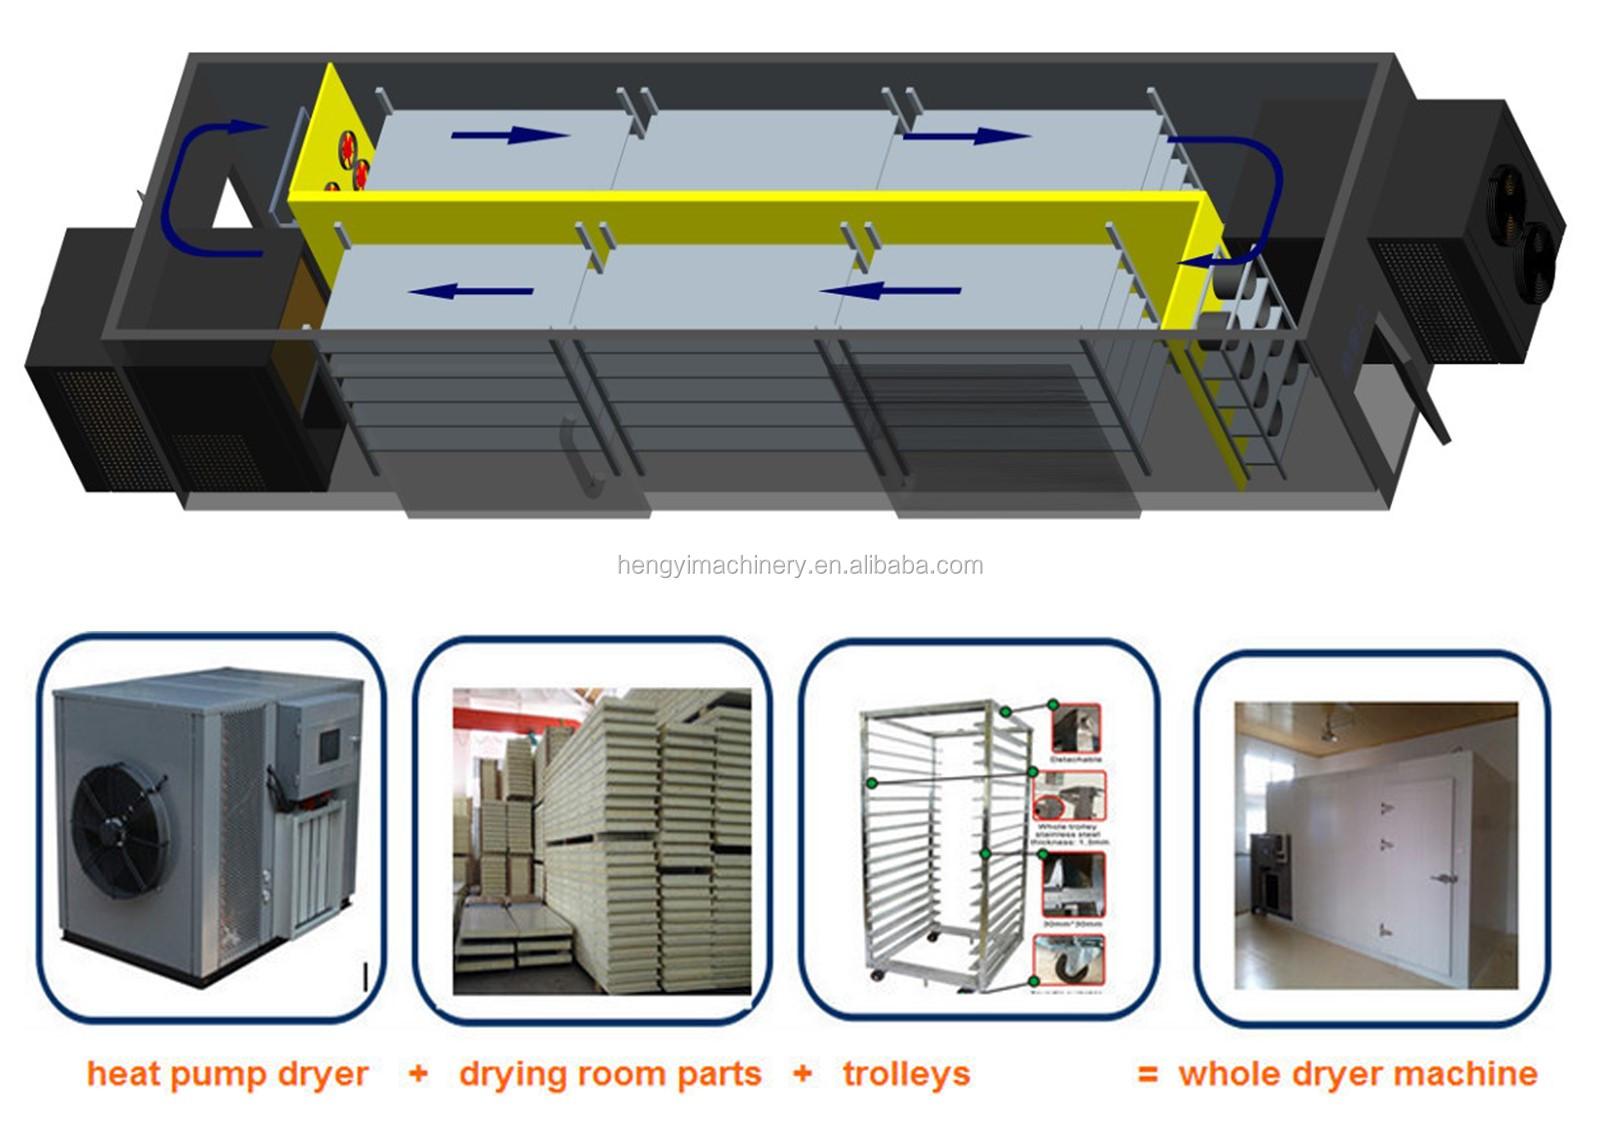 Food Dehydrator Excalibur Heating Element For Motors Wiring Diagram Hot Air And Heat Pump Type Kiwi Peach Dryer Oven Hengyi